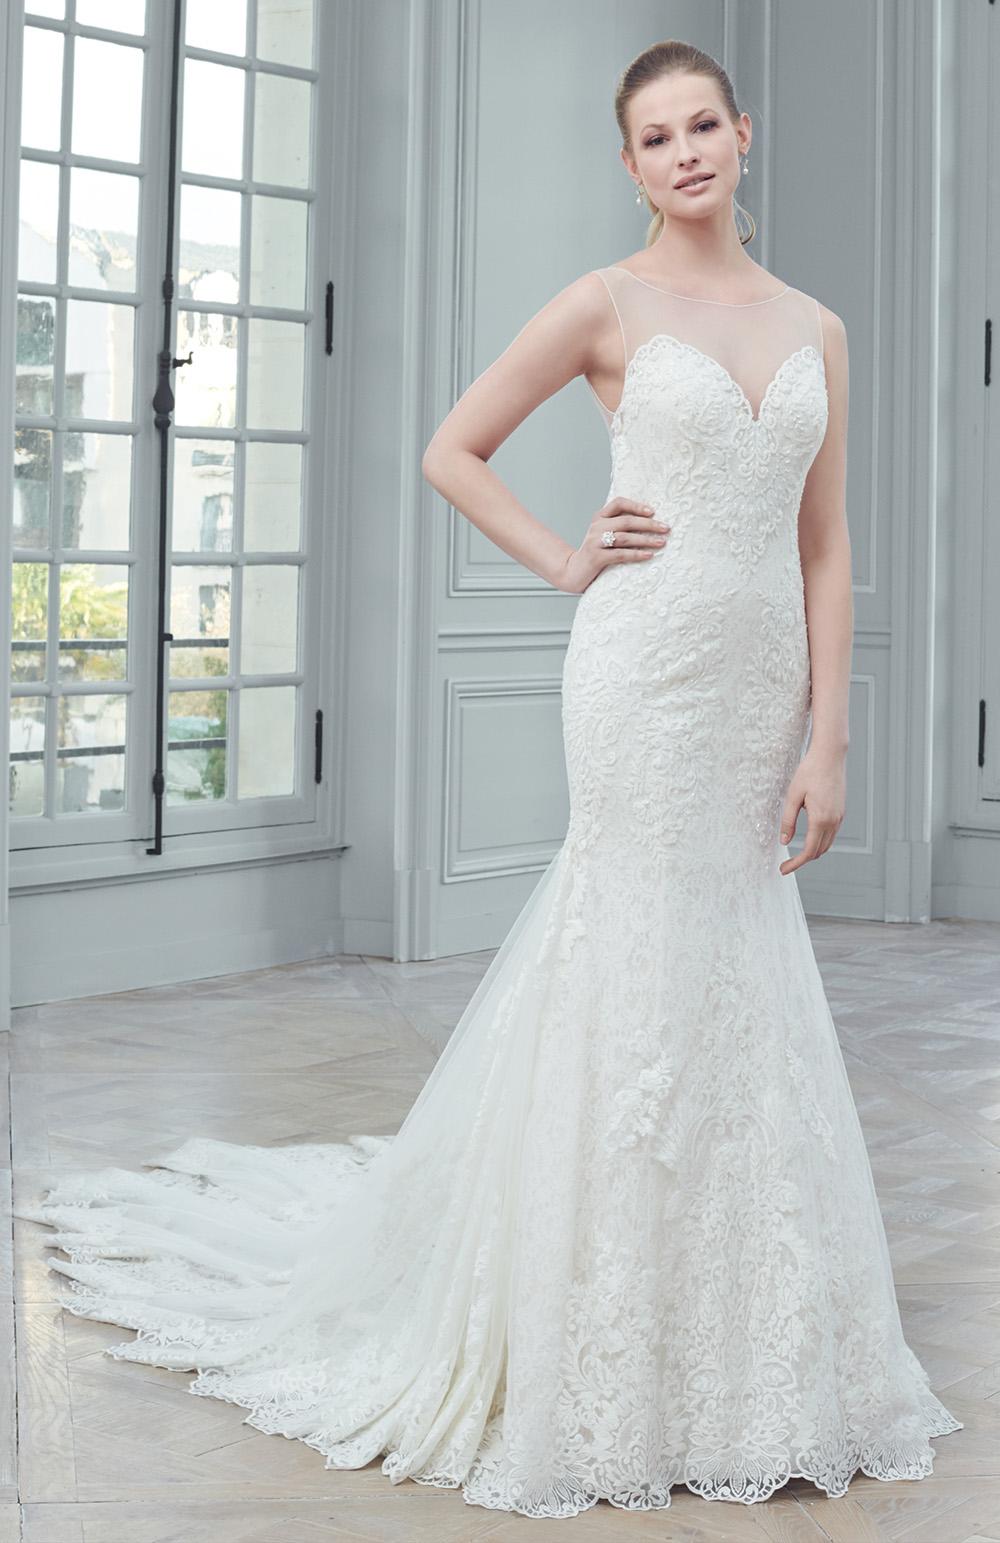 Robe de mariée Modèle Alana